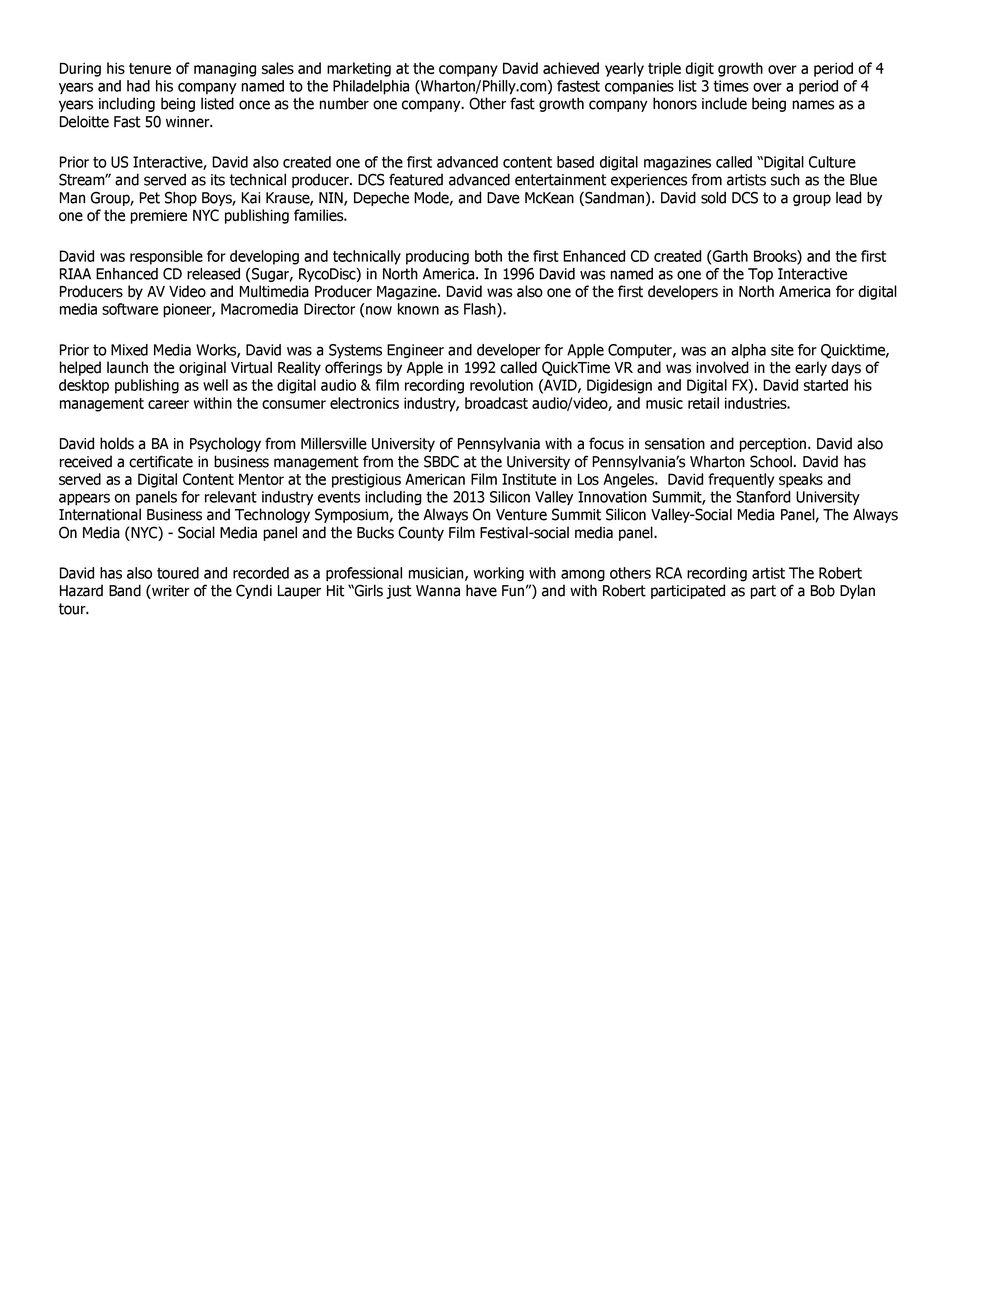 David.J.Russek.bio.10.16-page-002.jpg